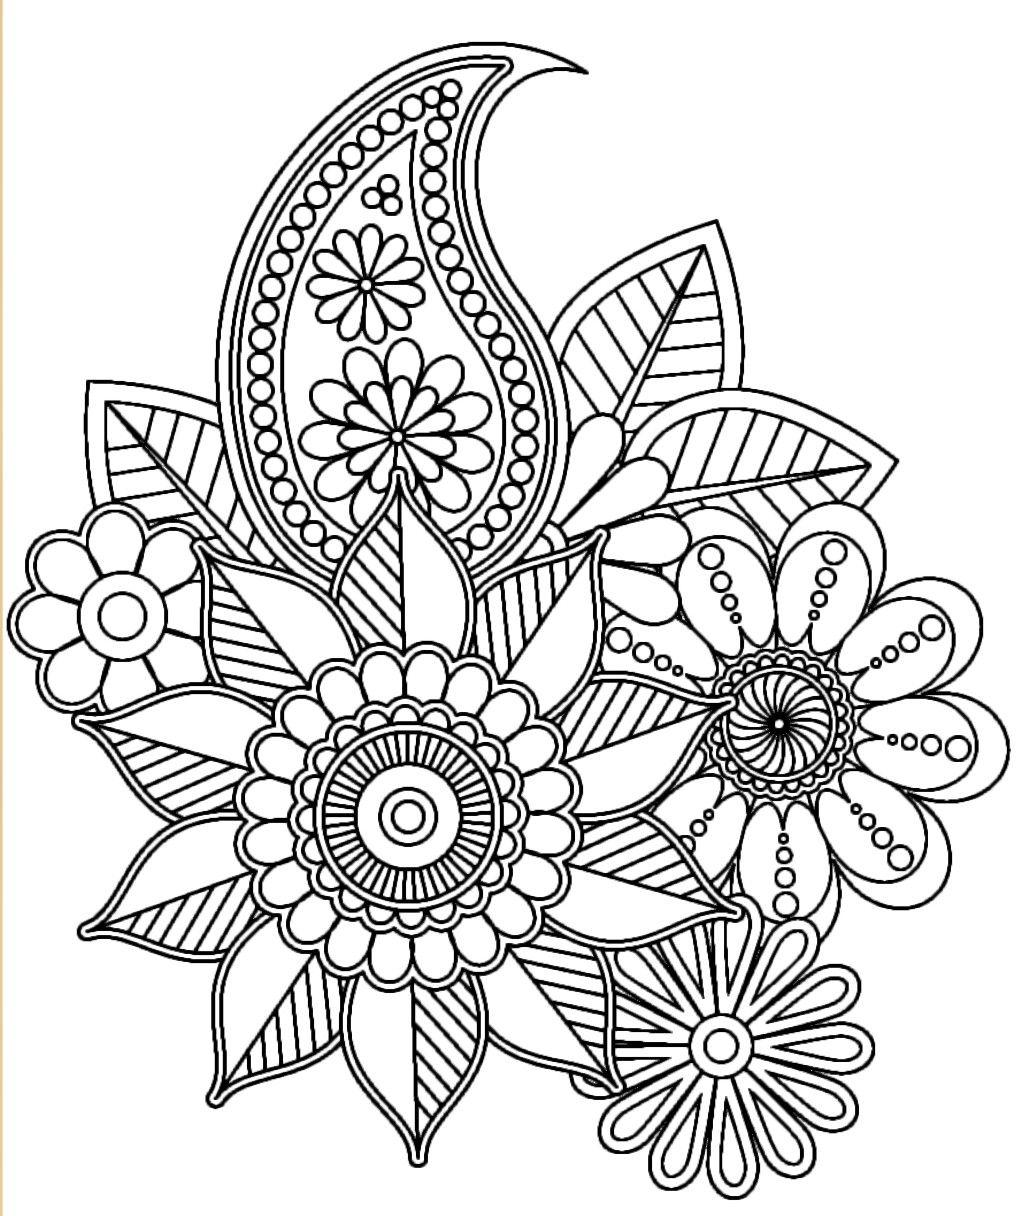 Floral design to colour  Mandala coloring pages, Mandala coloring